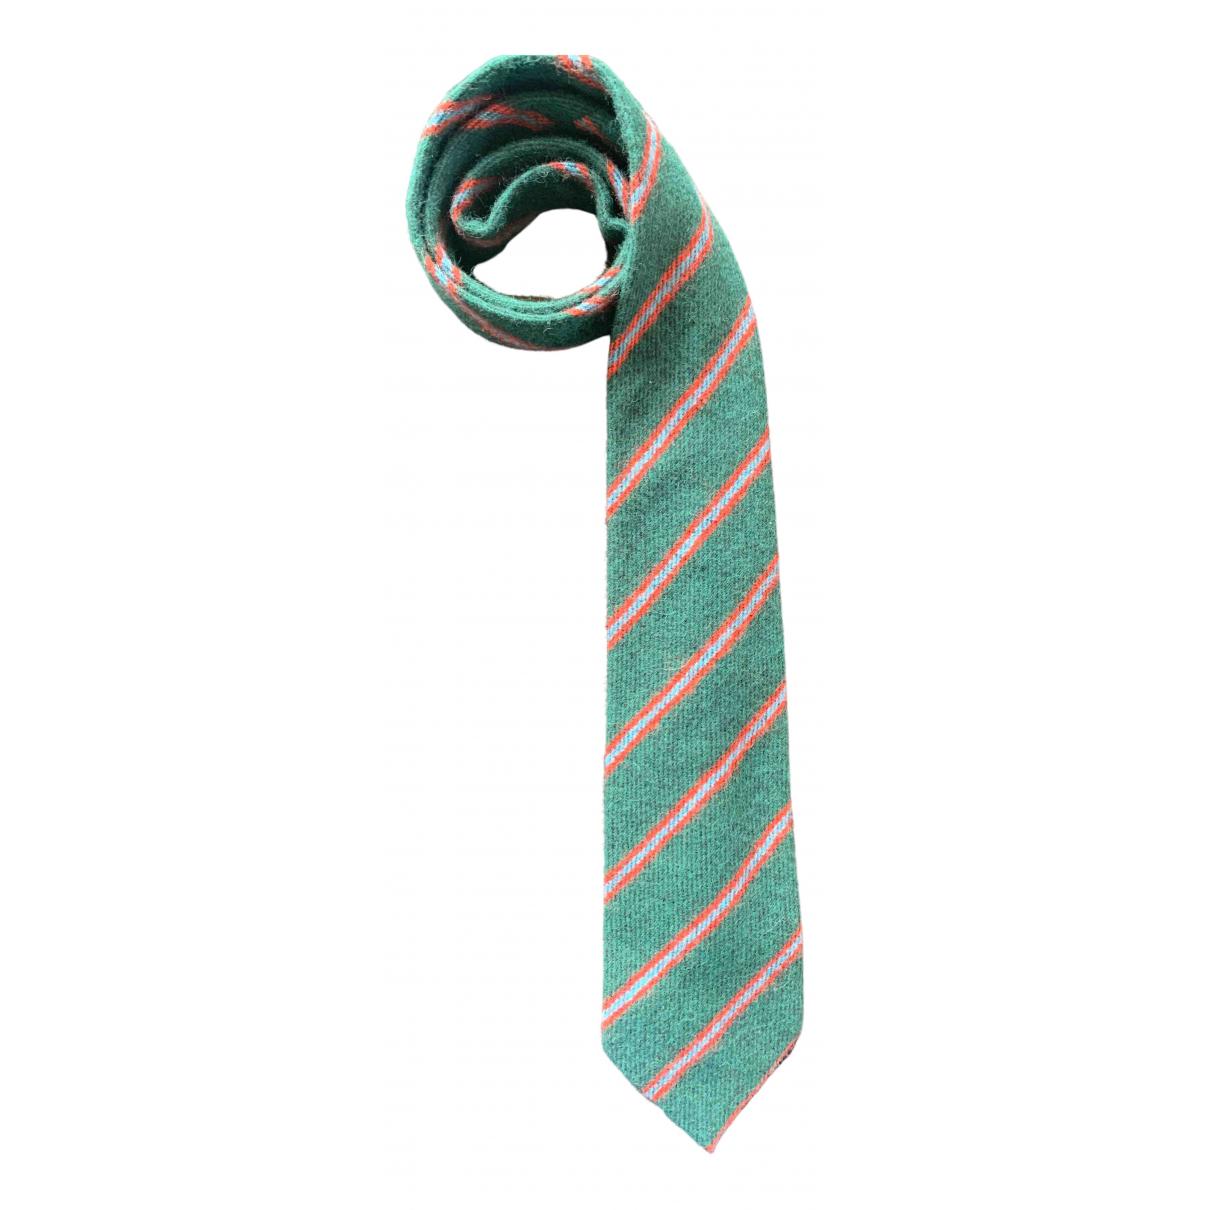 Yves Saint Laurent N Green Cashmere Ties for Men N